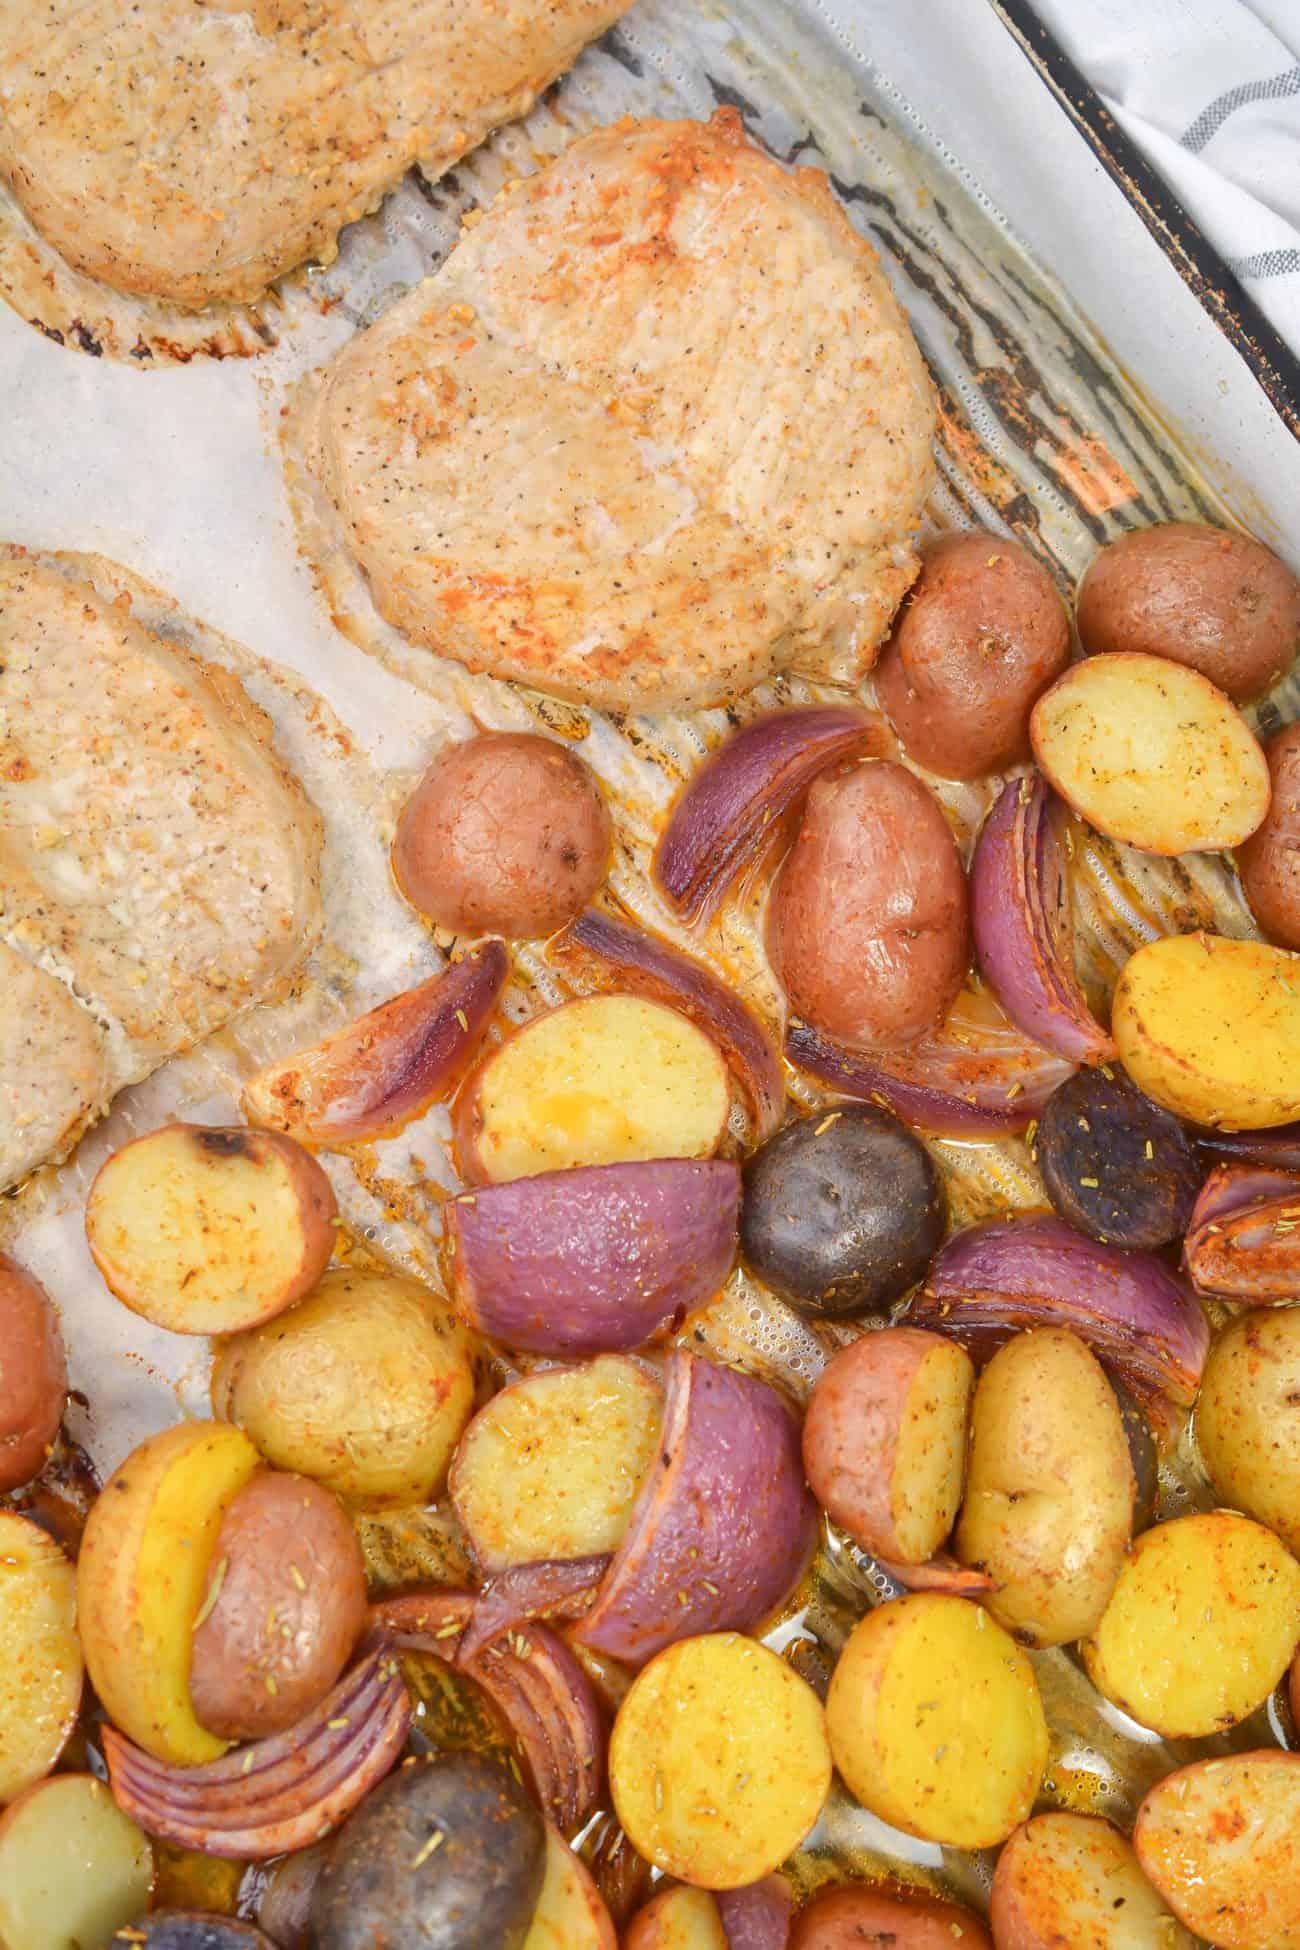 Sheet Pan Pork Chops with Multi Colored Potatoes